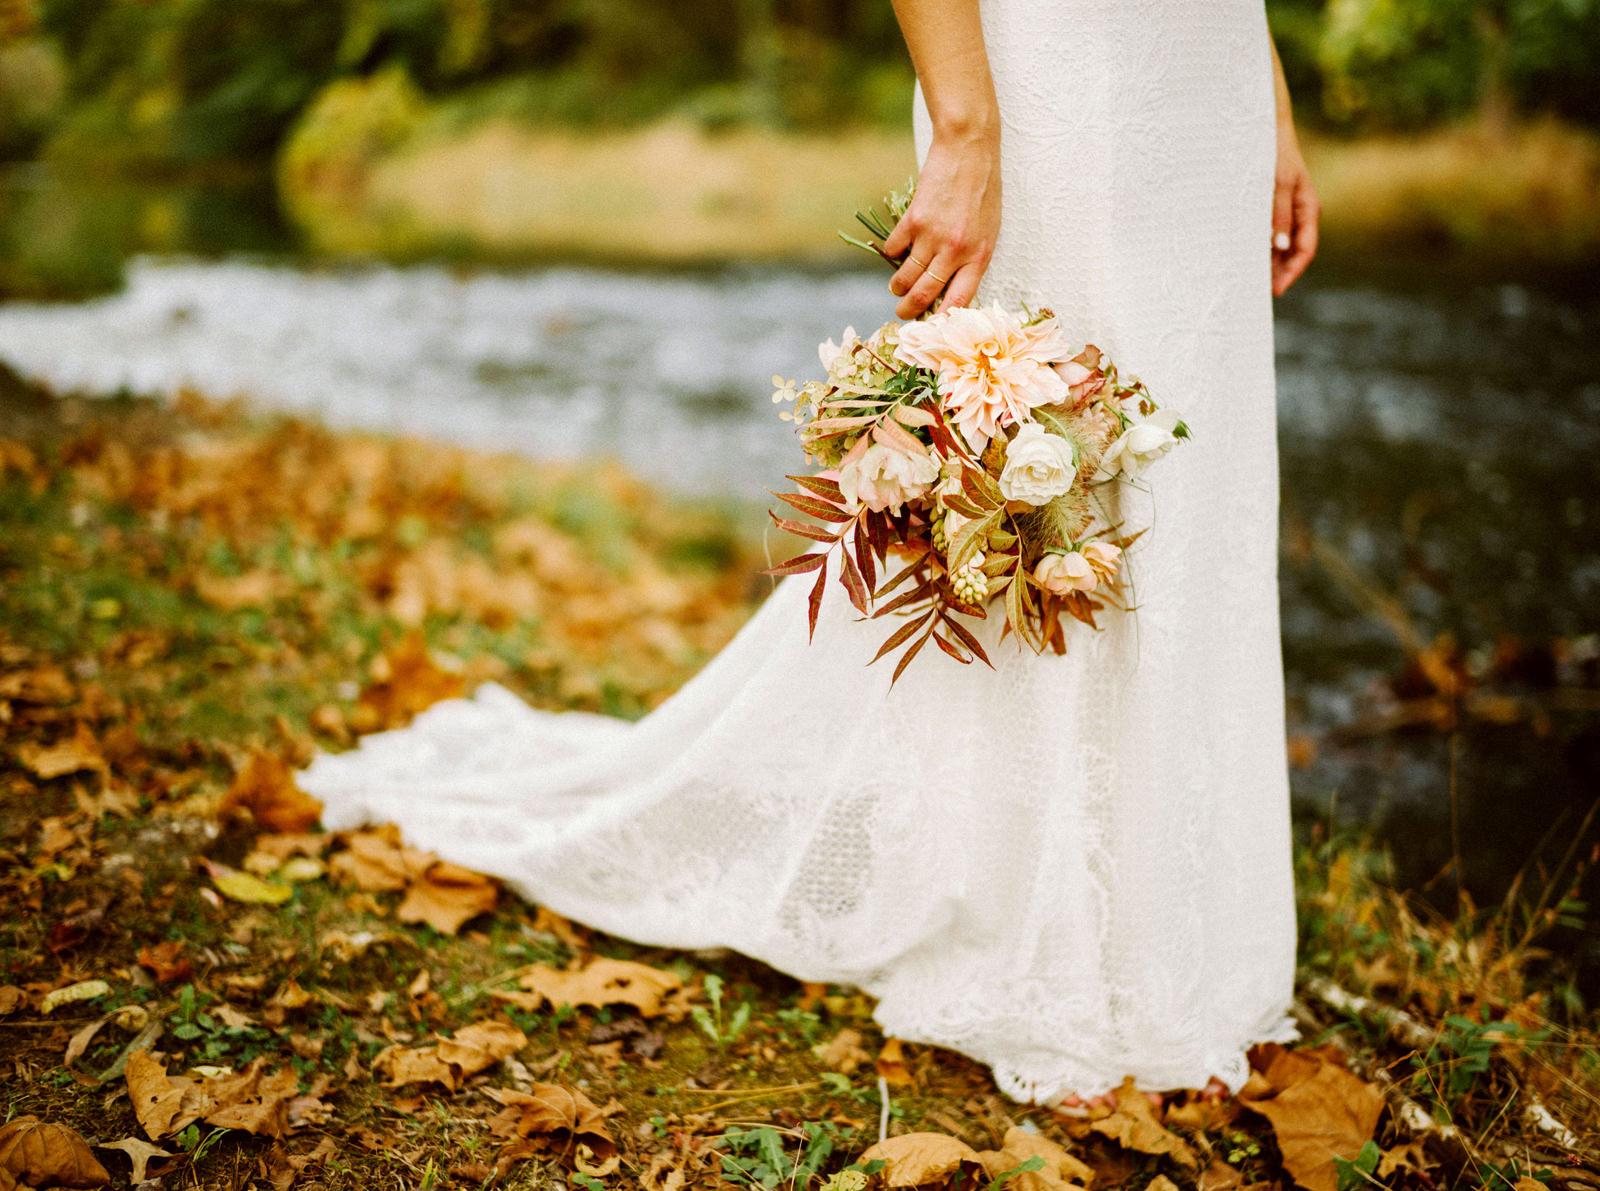 bridgeport-wedding-109 BRIDGEPORT, CONNECTICUT BACKYARD WEDDING